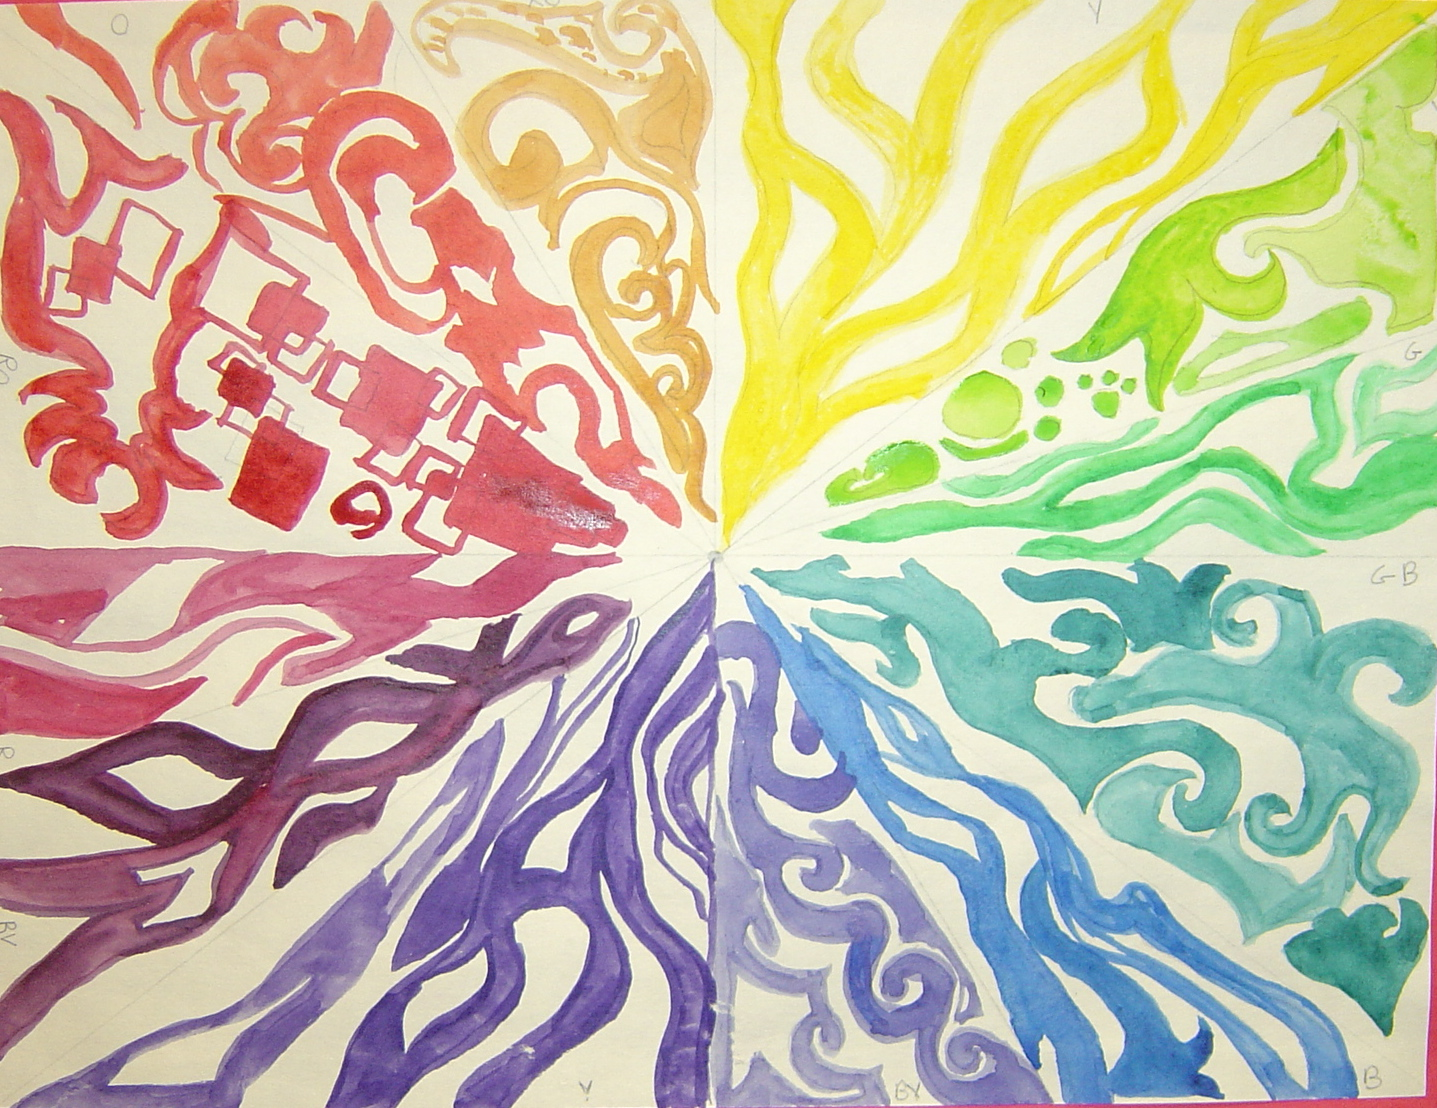 Sinking springs art 5th grade creative color wheels for Creative color wheel